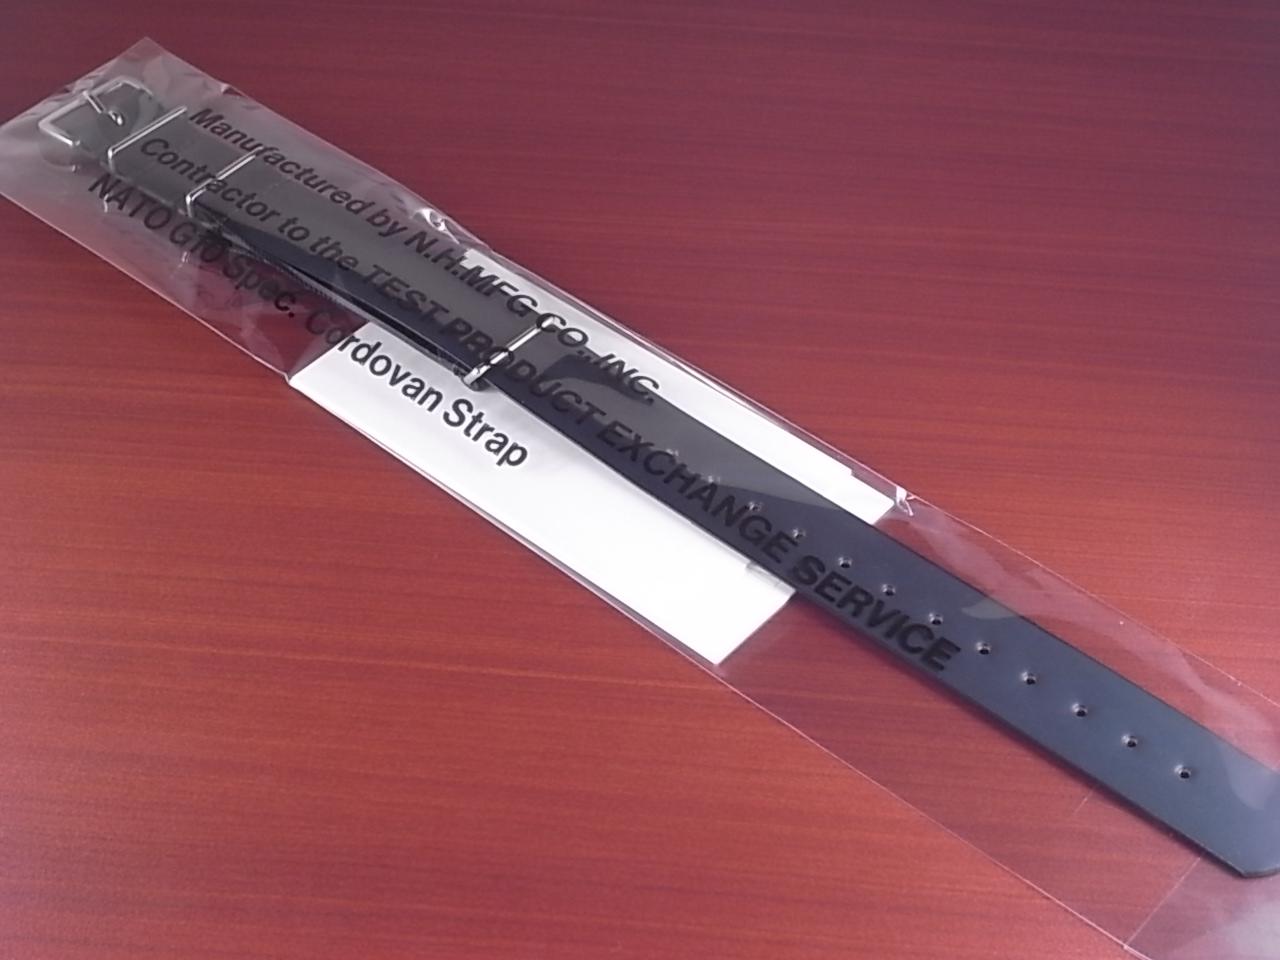 N.ハリウッド×キュリオスキュリオ コラボNATOコードバン革ベルトの写真6枚目